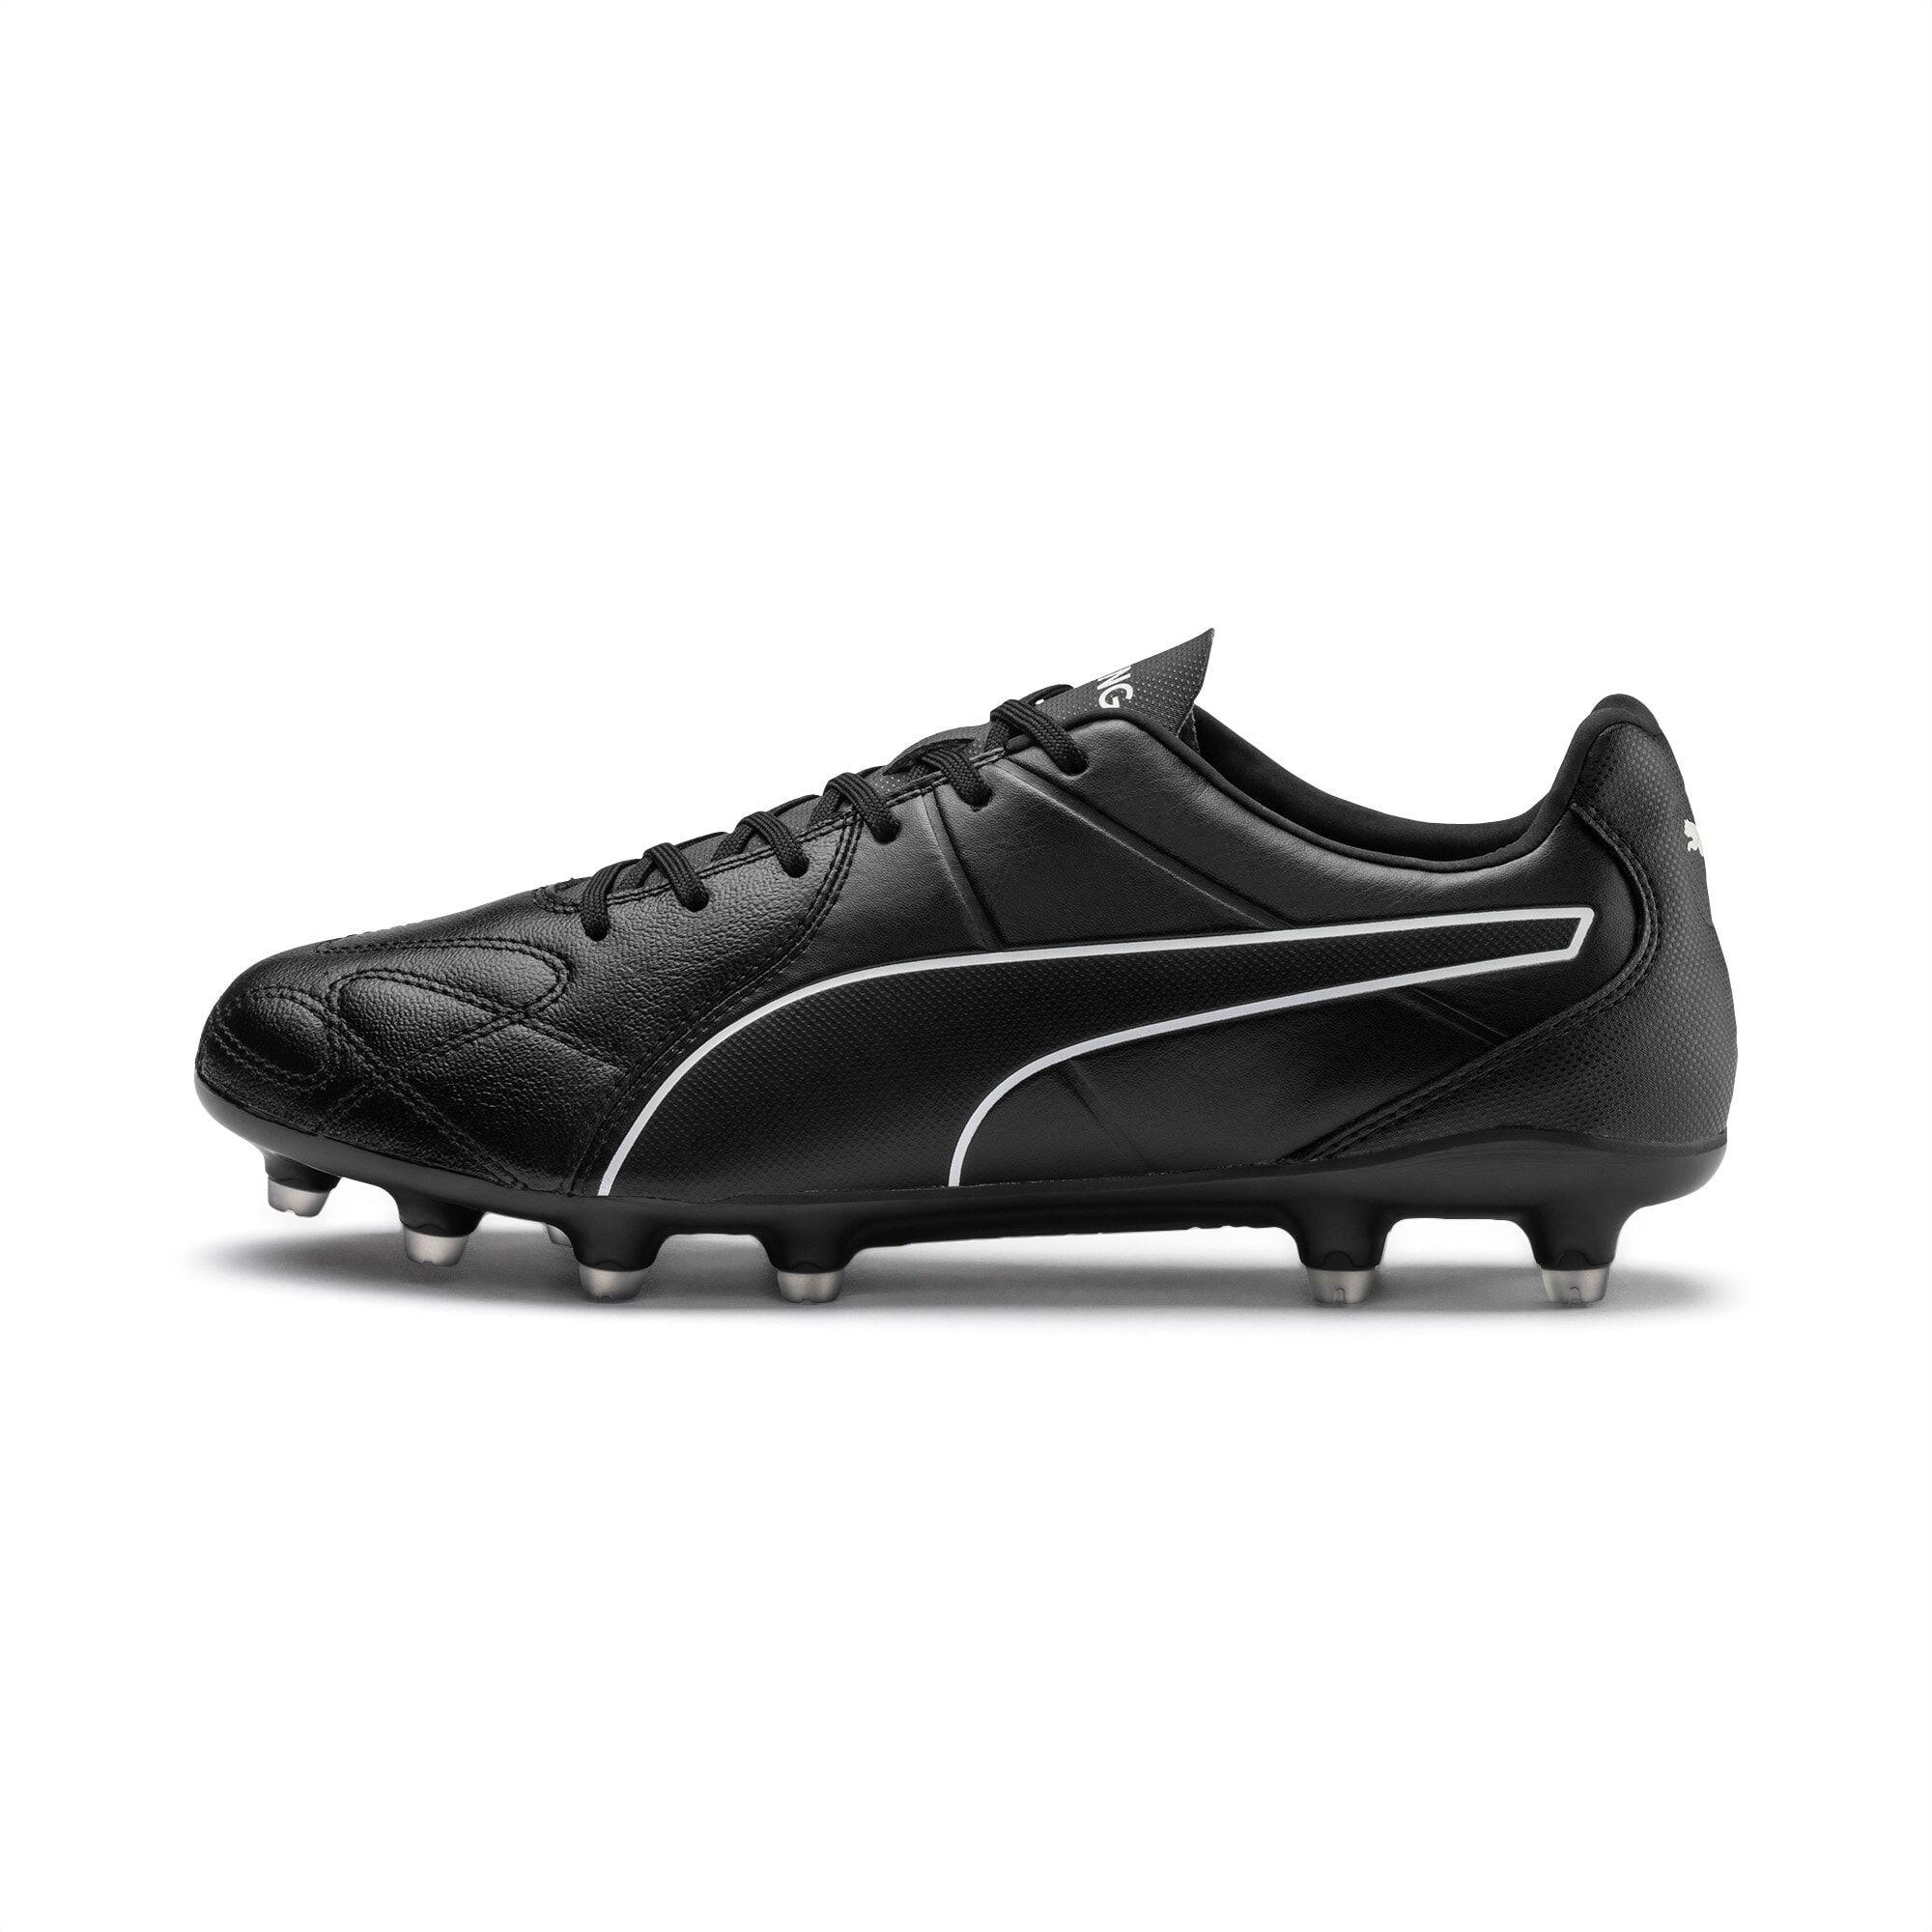 PUMA Chaussure de foot KING Hero FG, Noir/Blanc, Taille 38.5, Accessoires